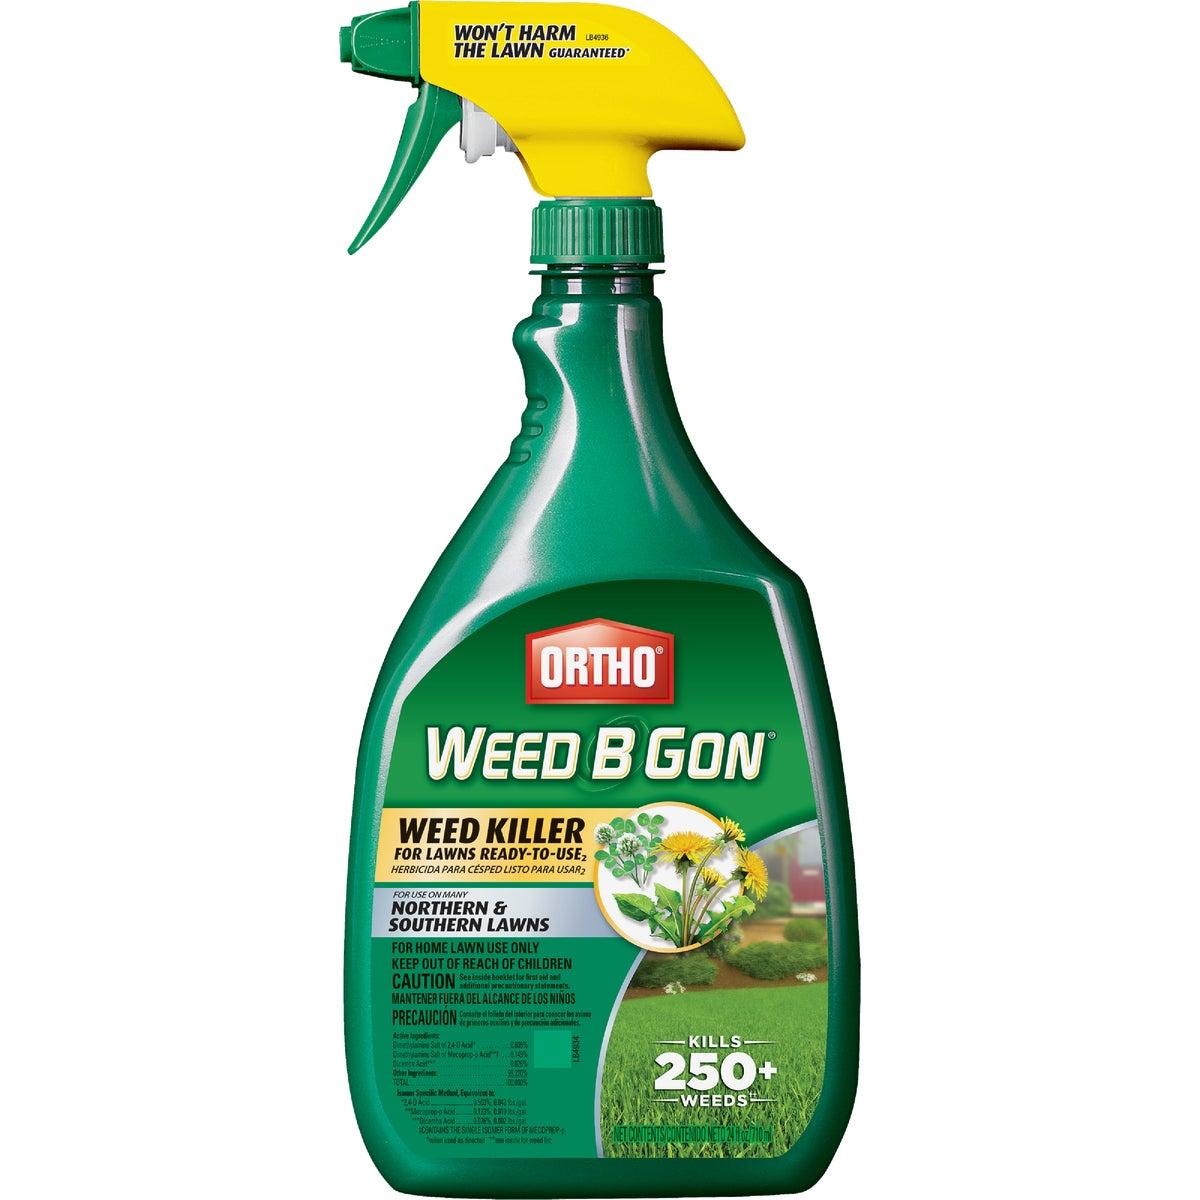 24OZ WEED B GON SPRAY